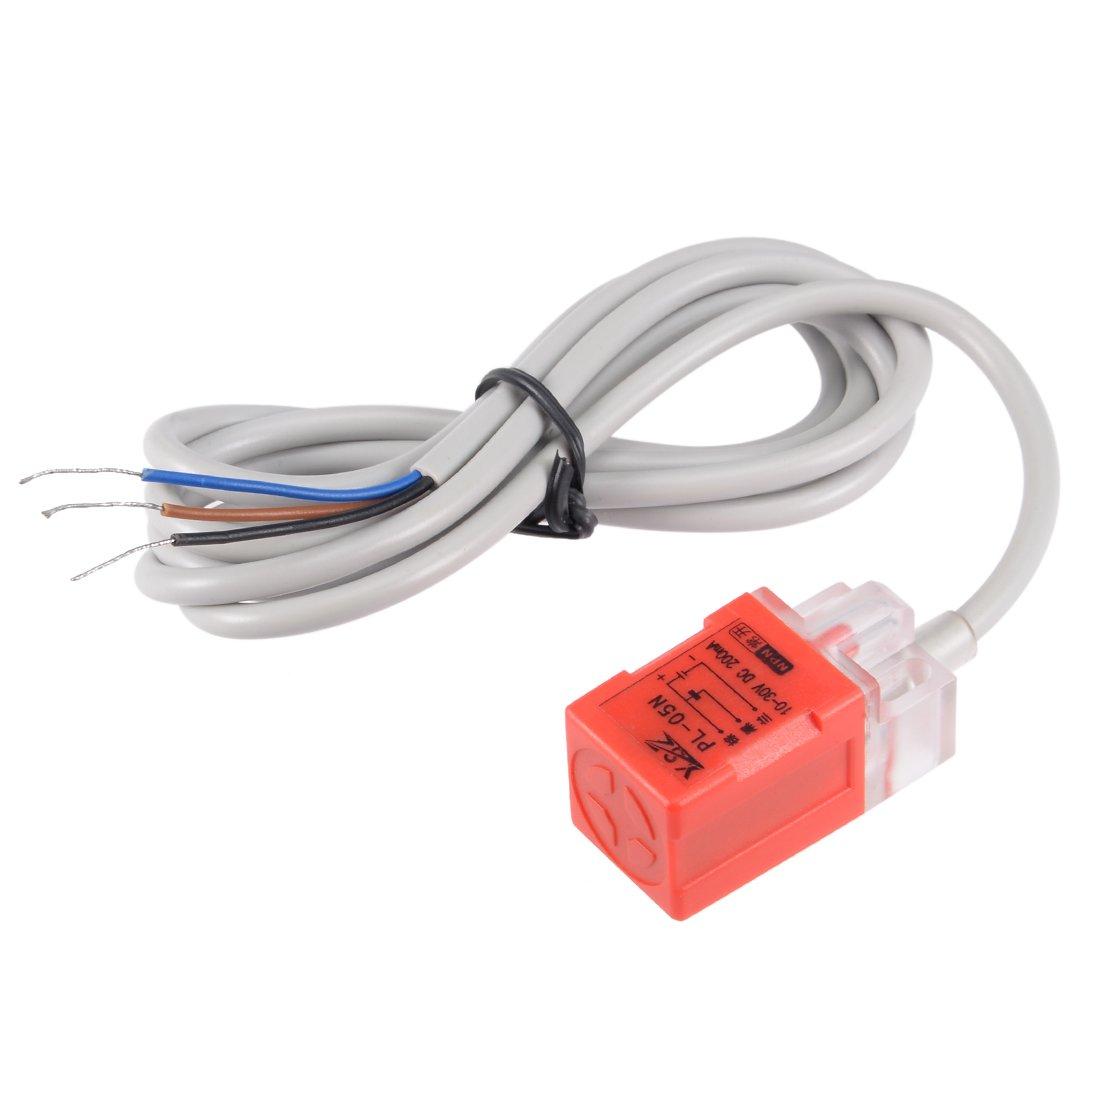 Proximity Sensor Wiring Diagrams On Wire Proximity Sensor Wiring